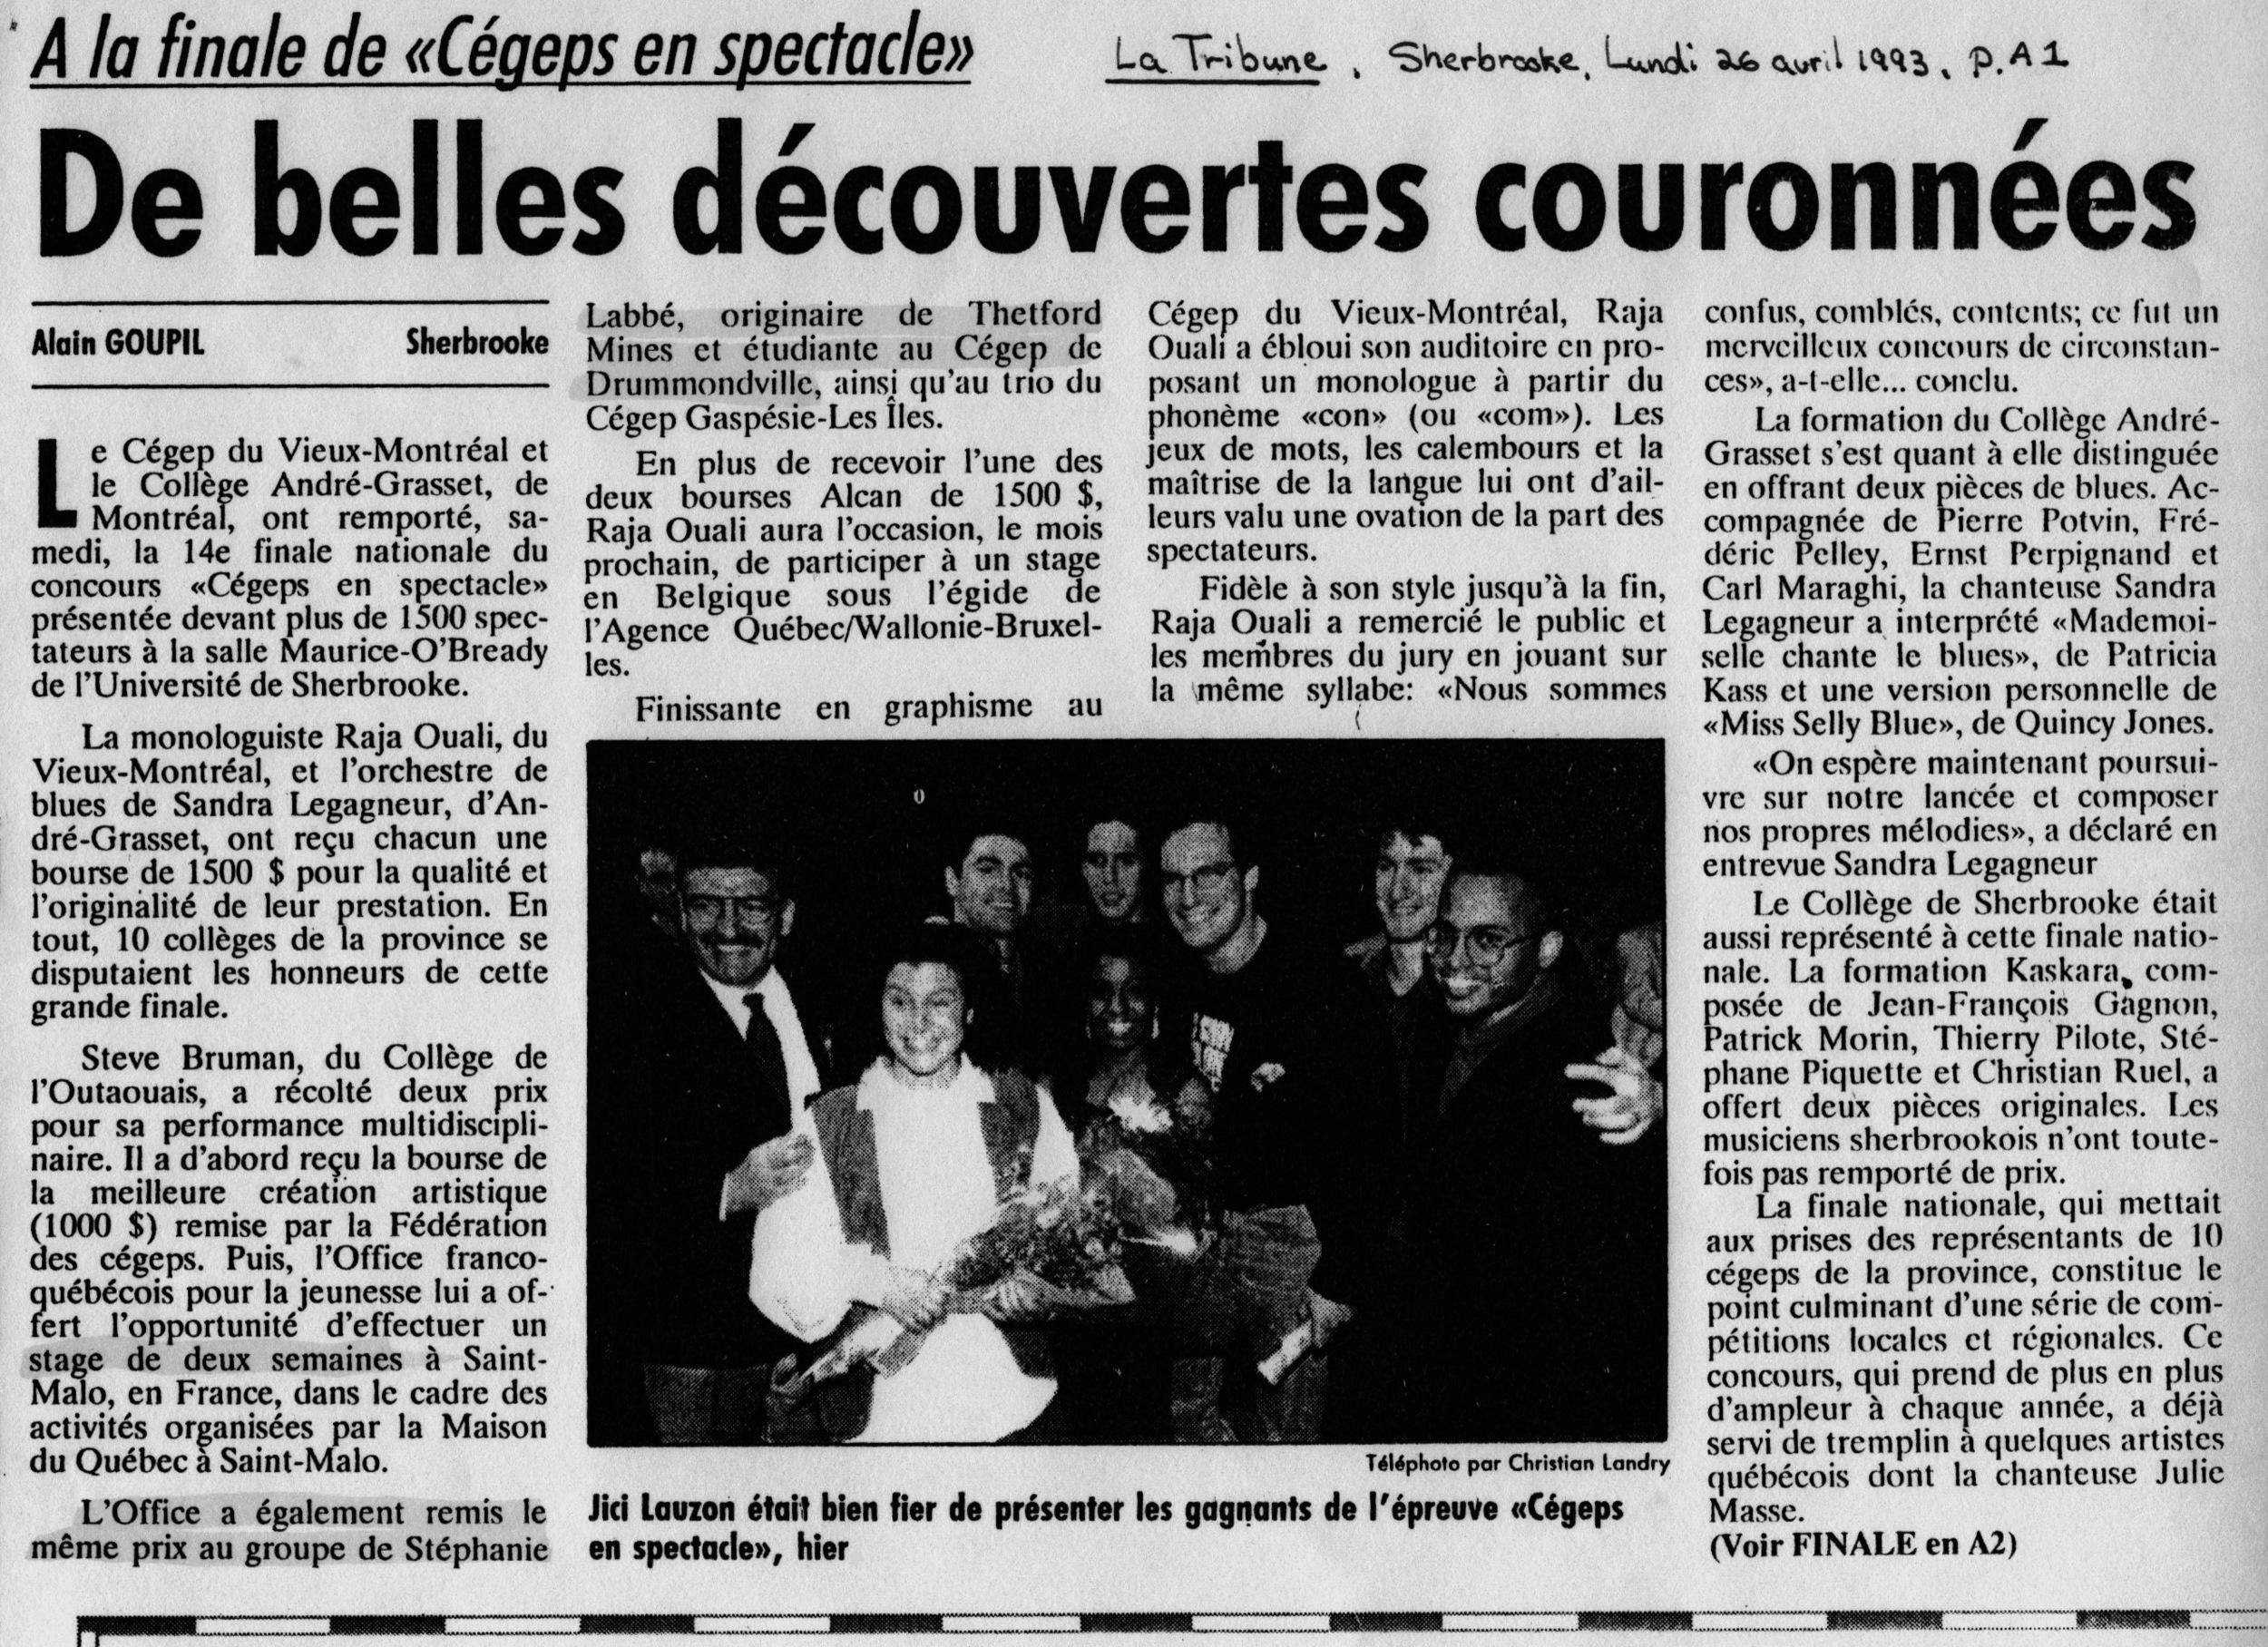 La Tribune, Sherbrooke, 26 avril 1993